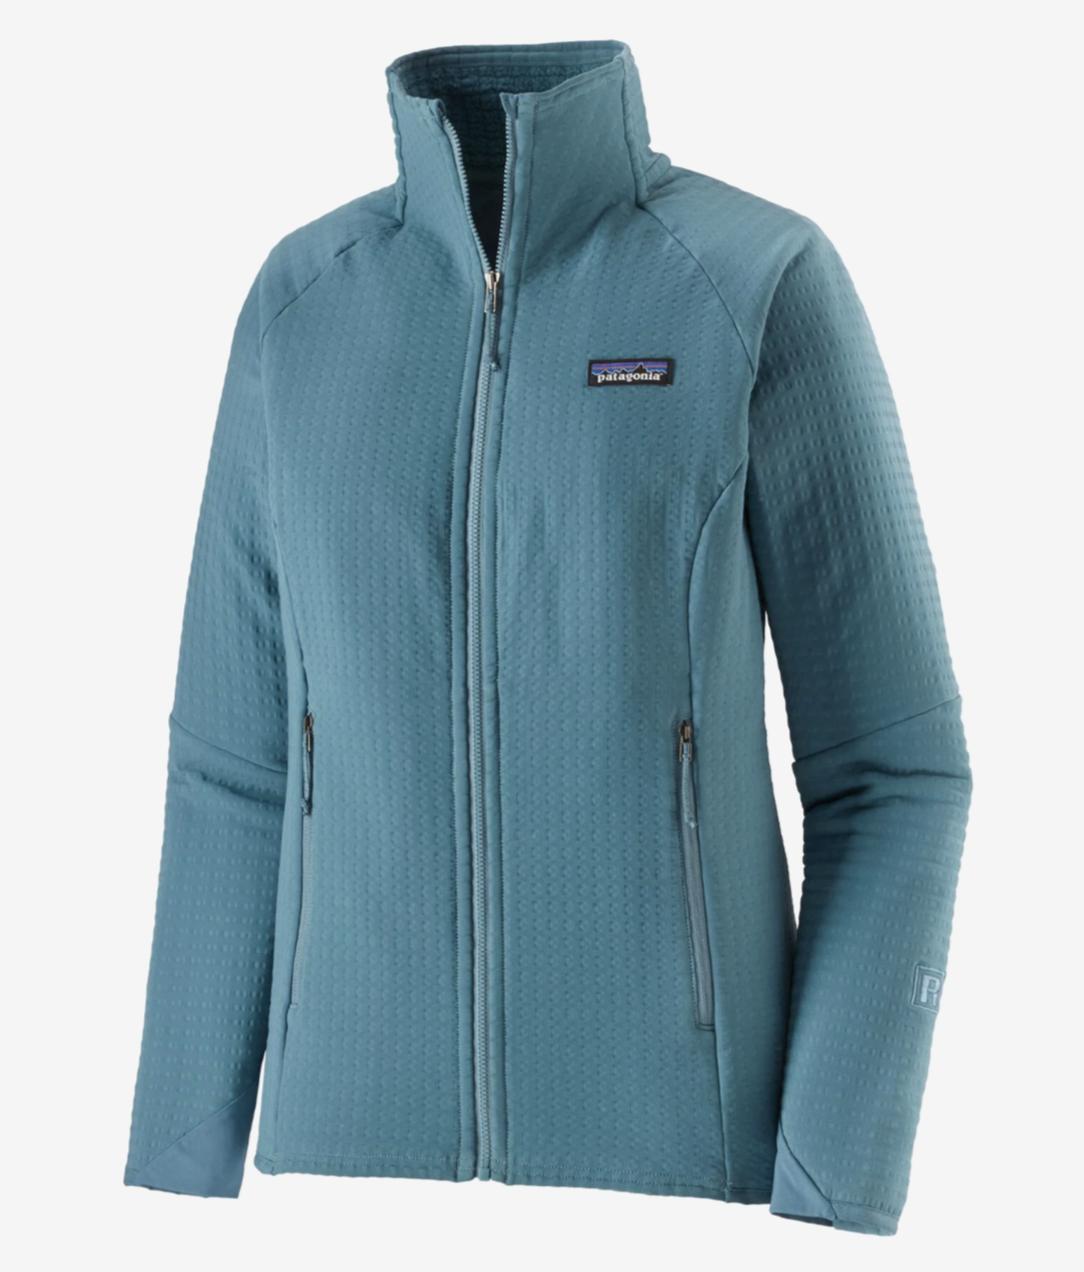 Patagonia R2 Tech Face Jacket Women's